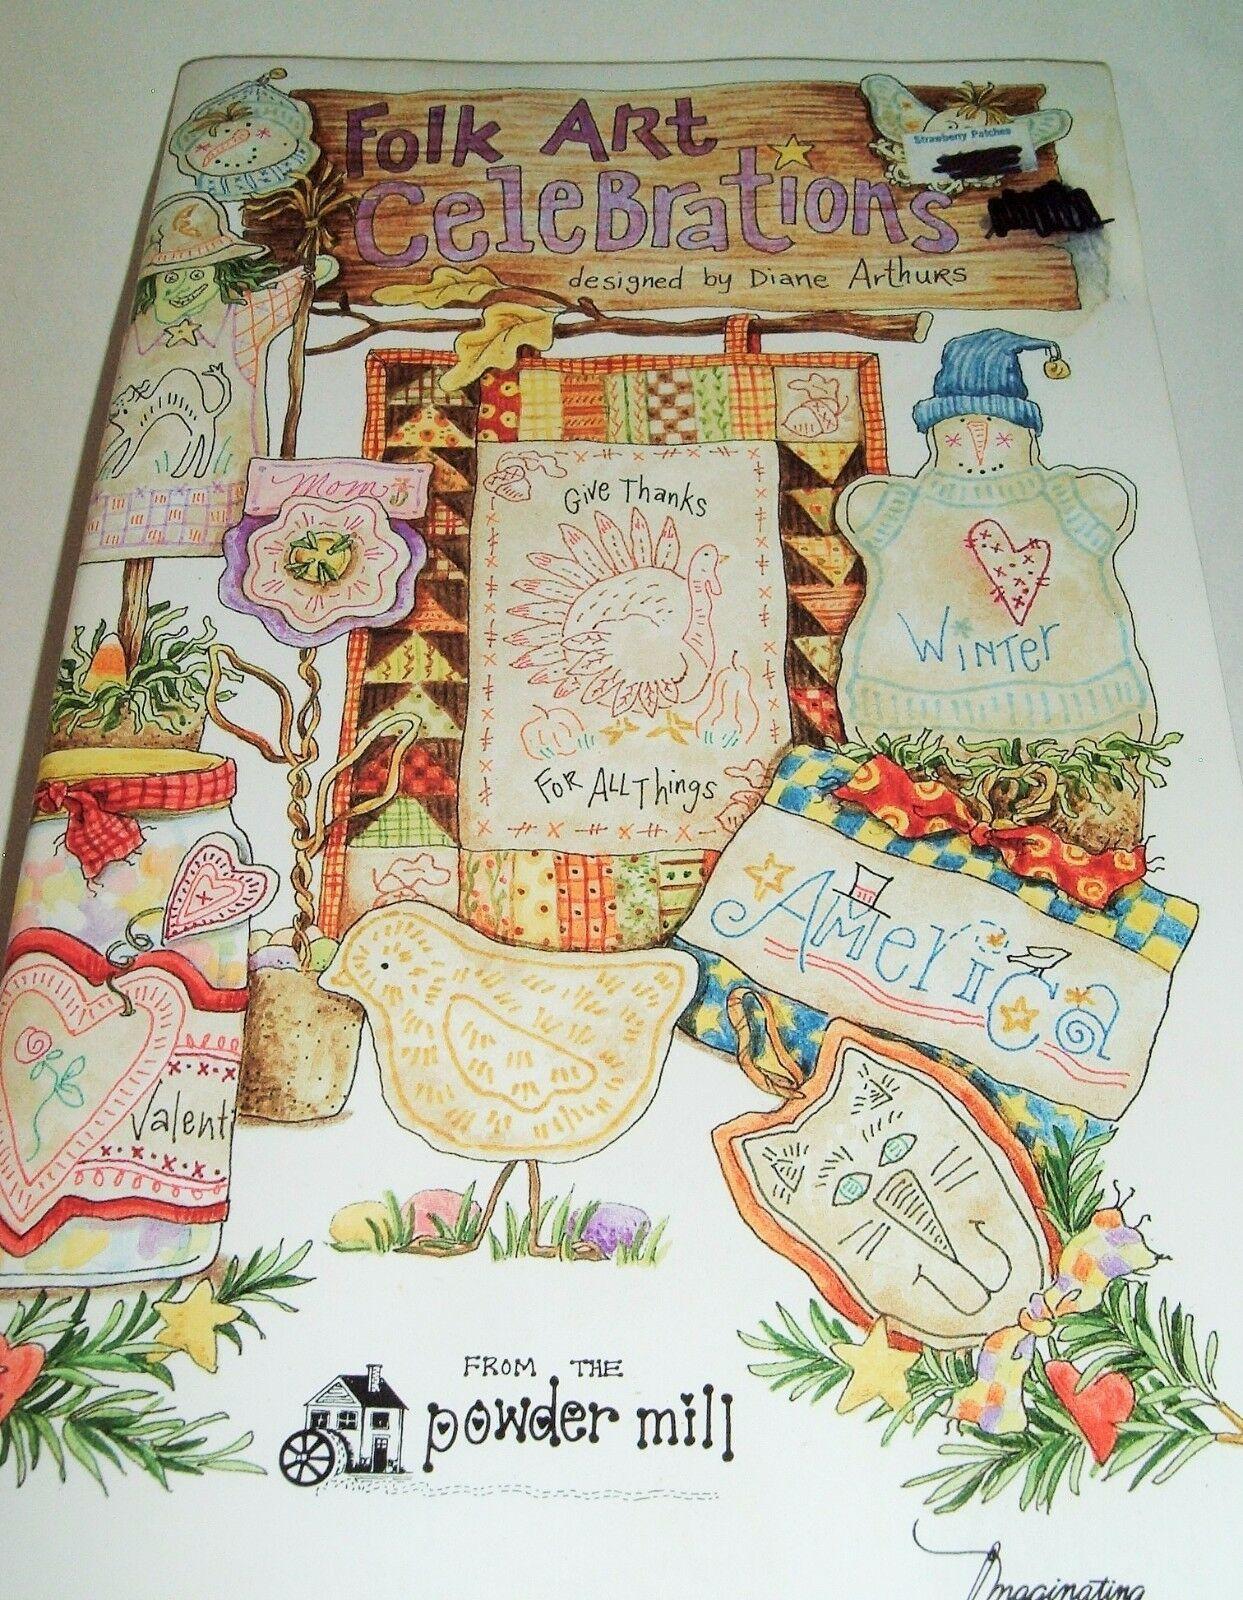 FOLK ART Celebrations Booklet 2001 - DIANE ARTHURS - IMAGINATING-Powder Mill - $10.86